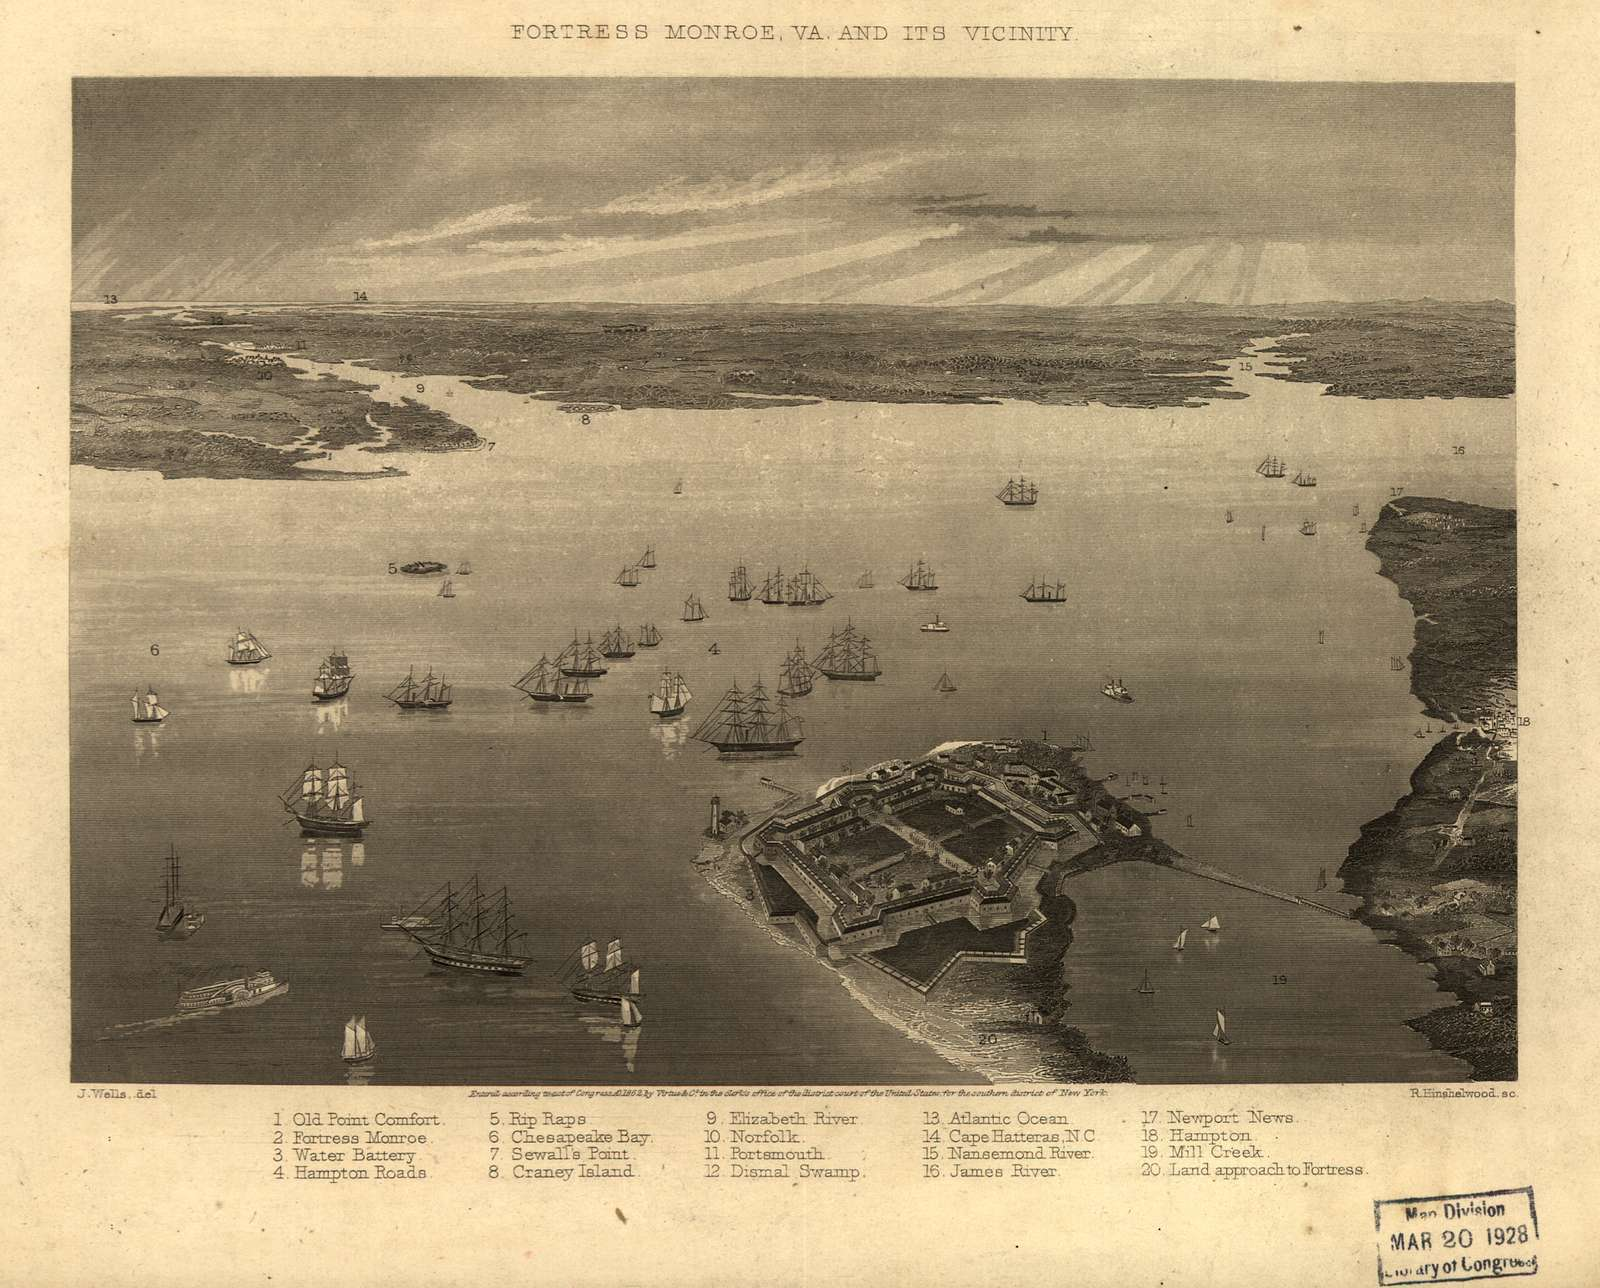 Fortress Monroe, Va. and its vicinity